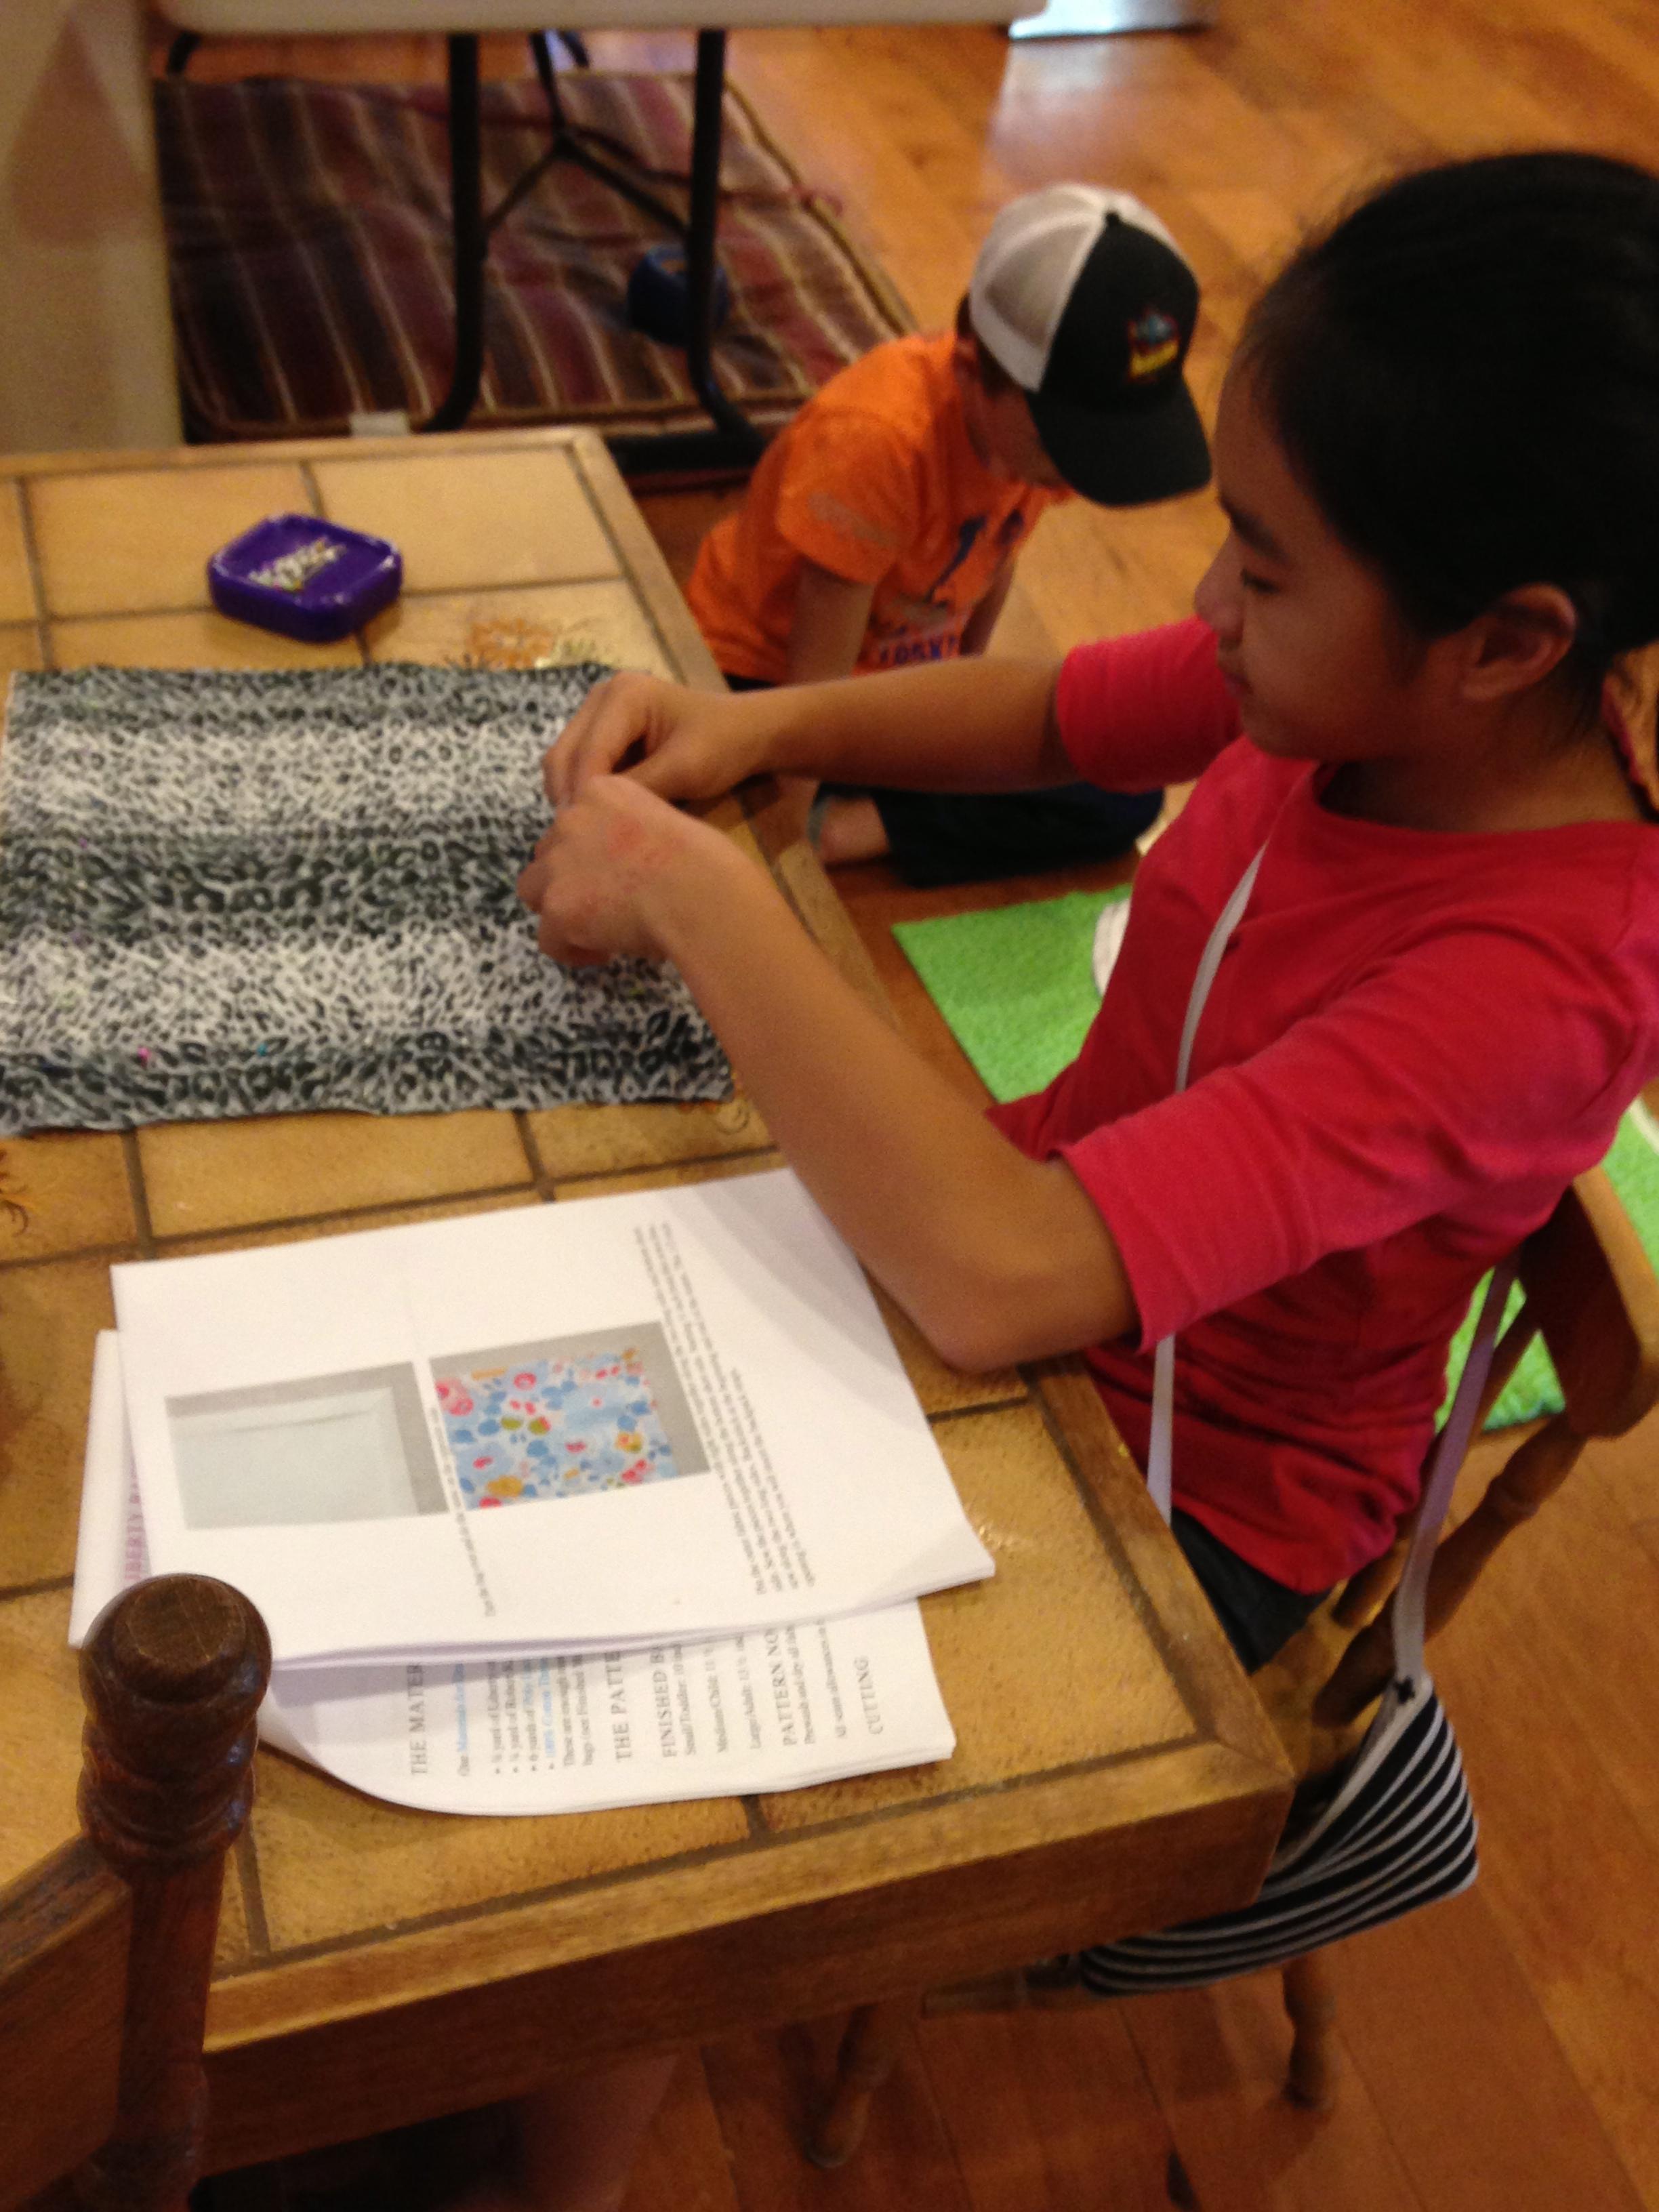 7th grader-drawstring backpack